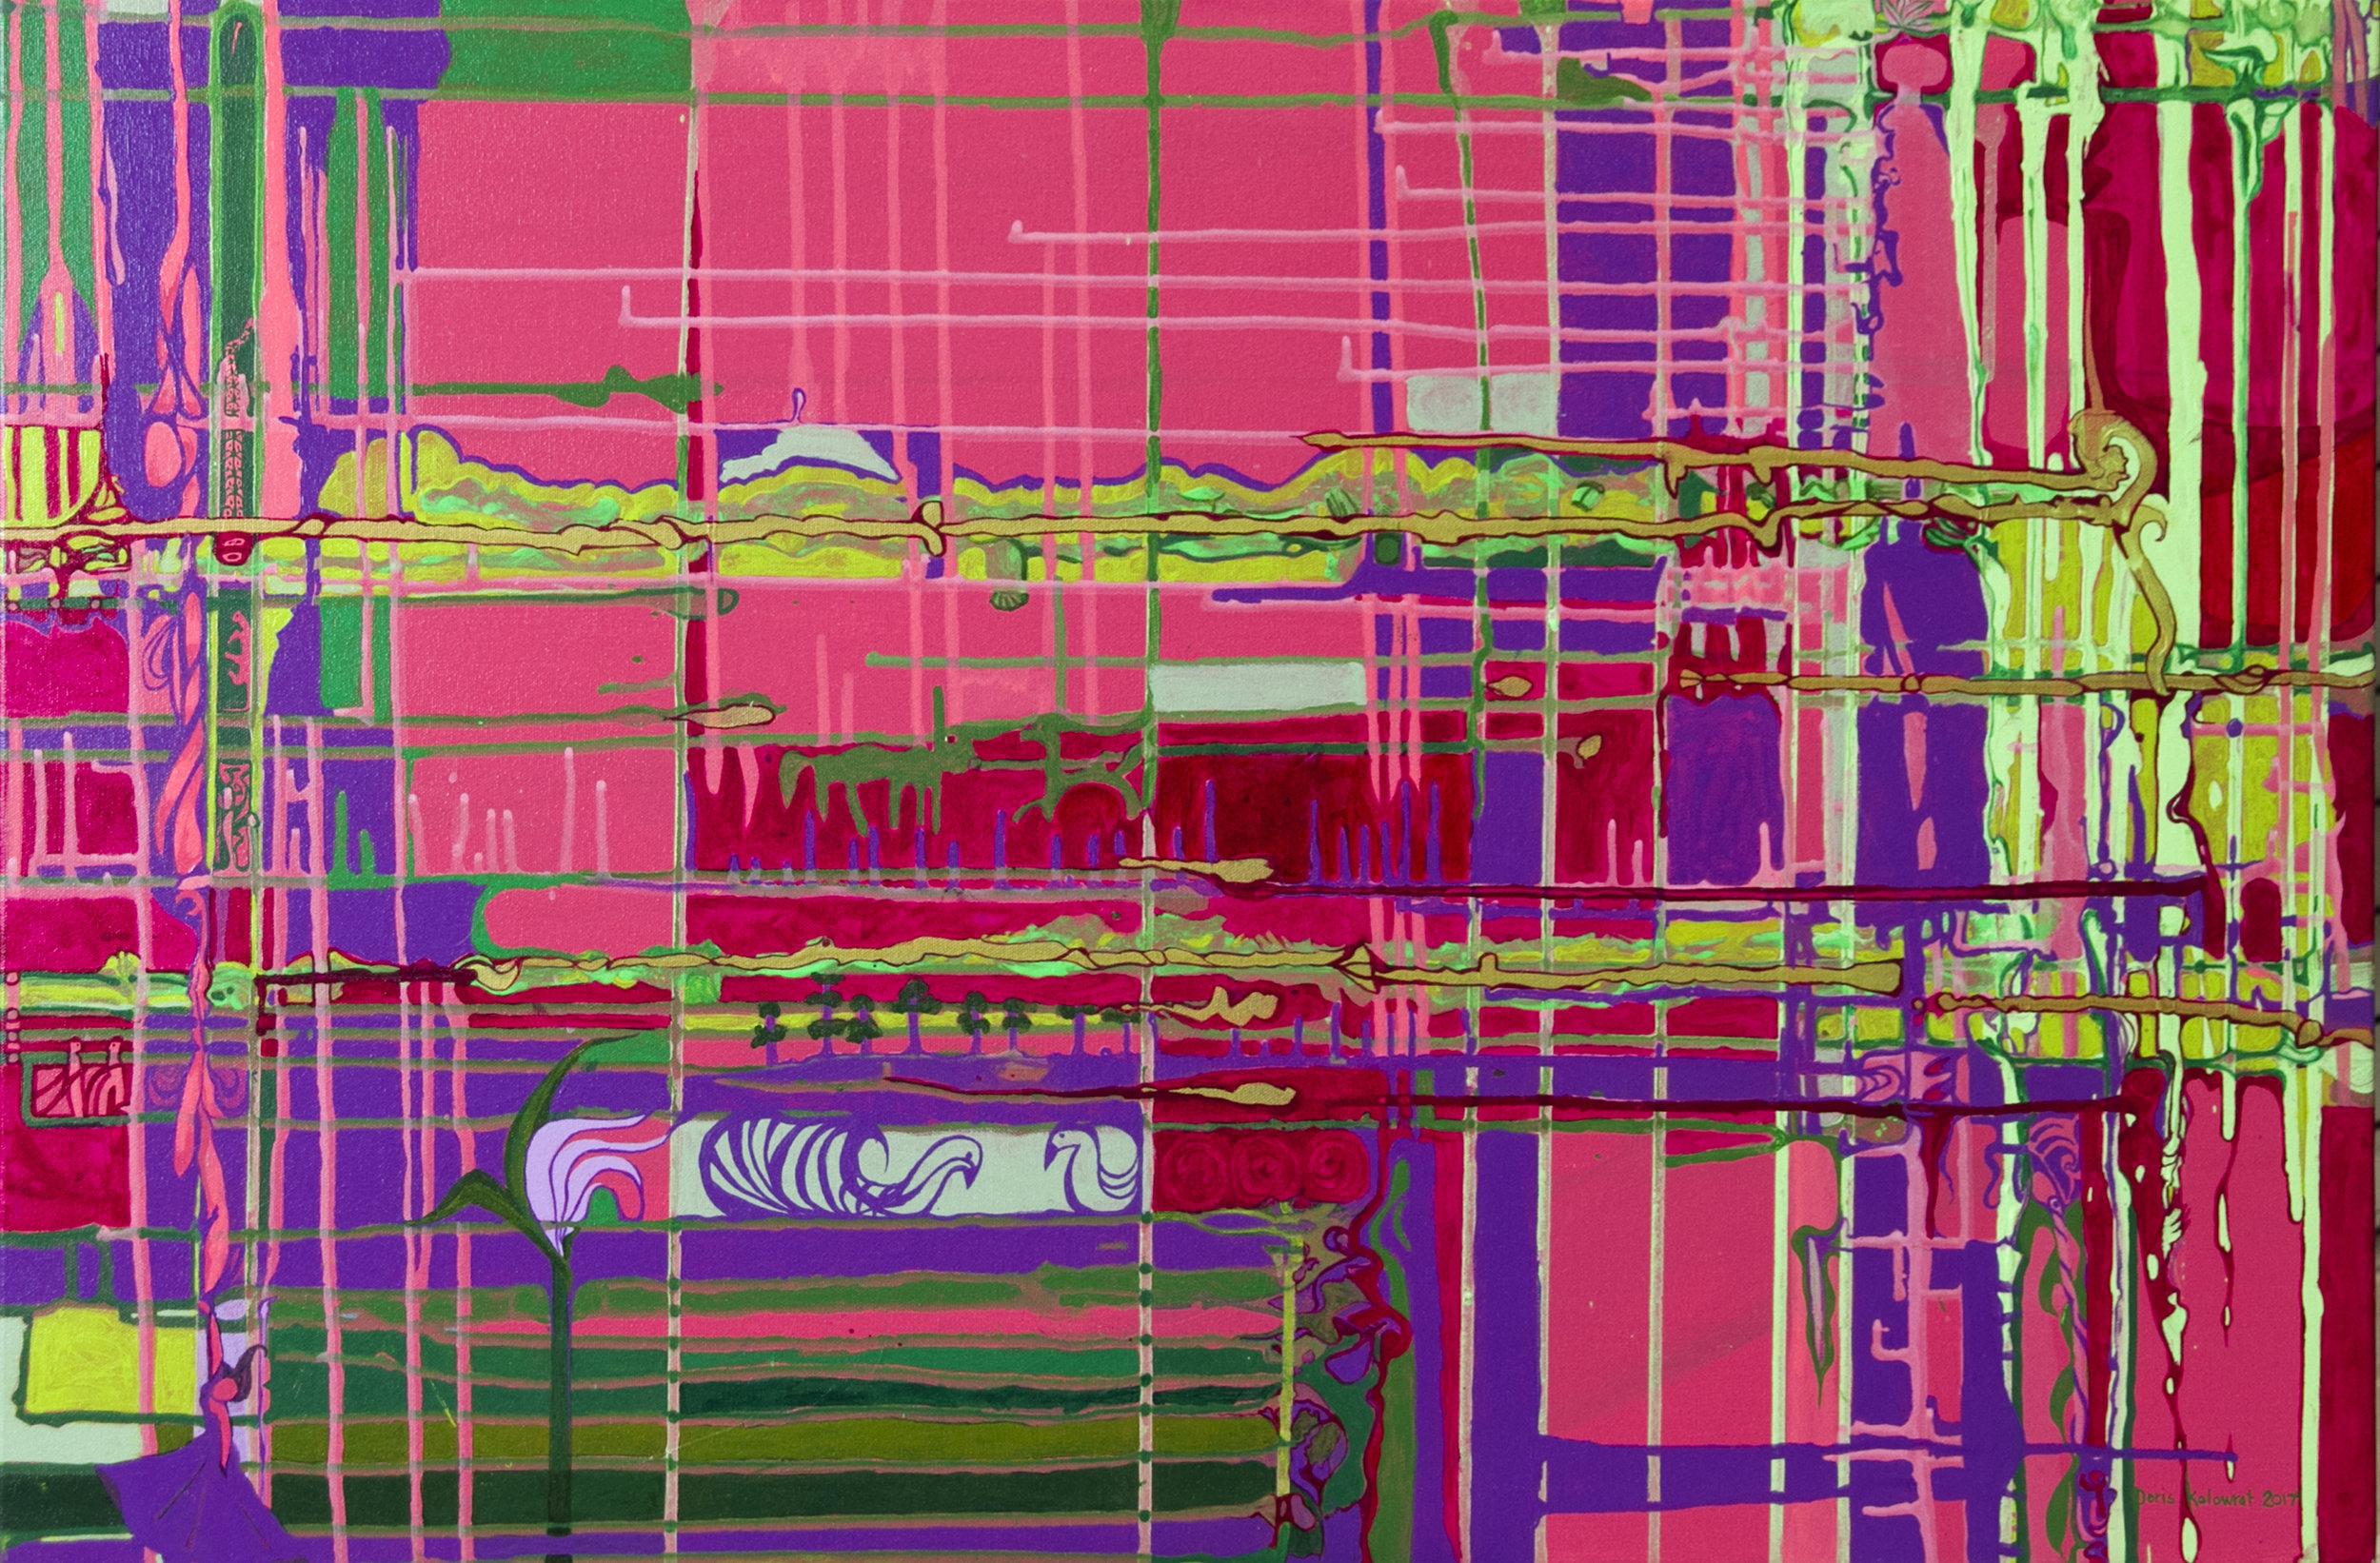 10 'Palette of Limitations' 4.jpg